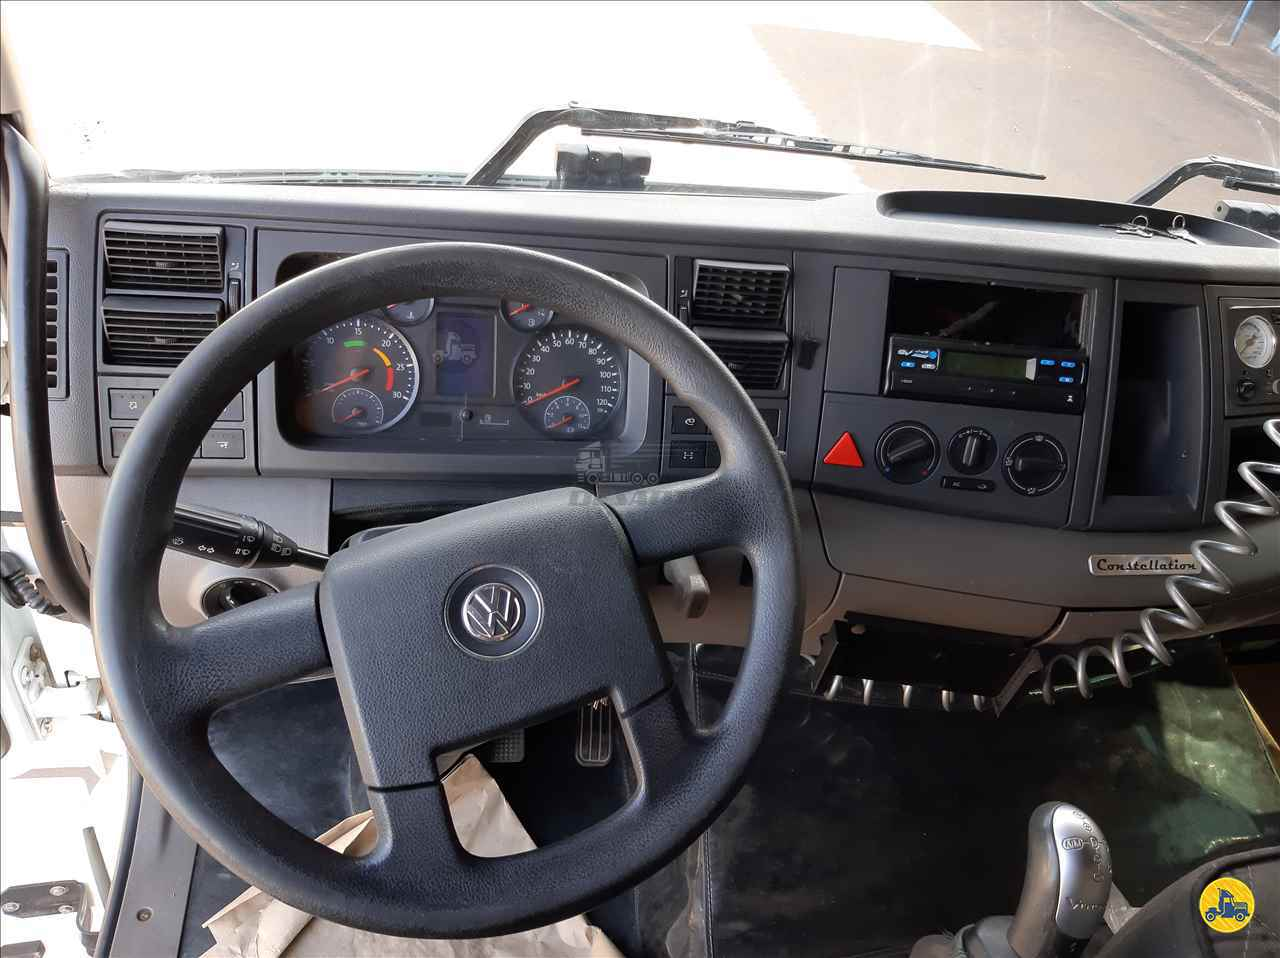 VOLKSWAGEN VW 25420 501089km 2015/2015 De Santi Caminhões